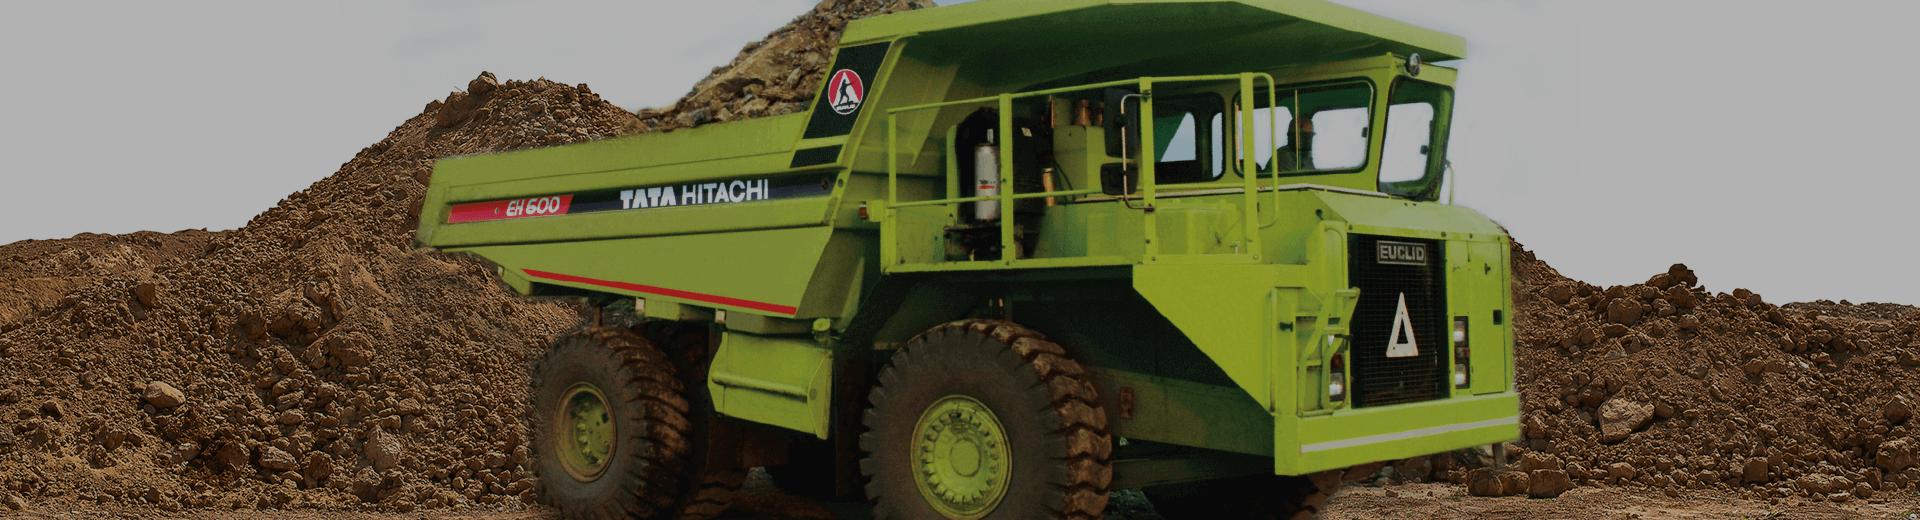 Dump Trucks EH 600